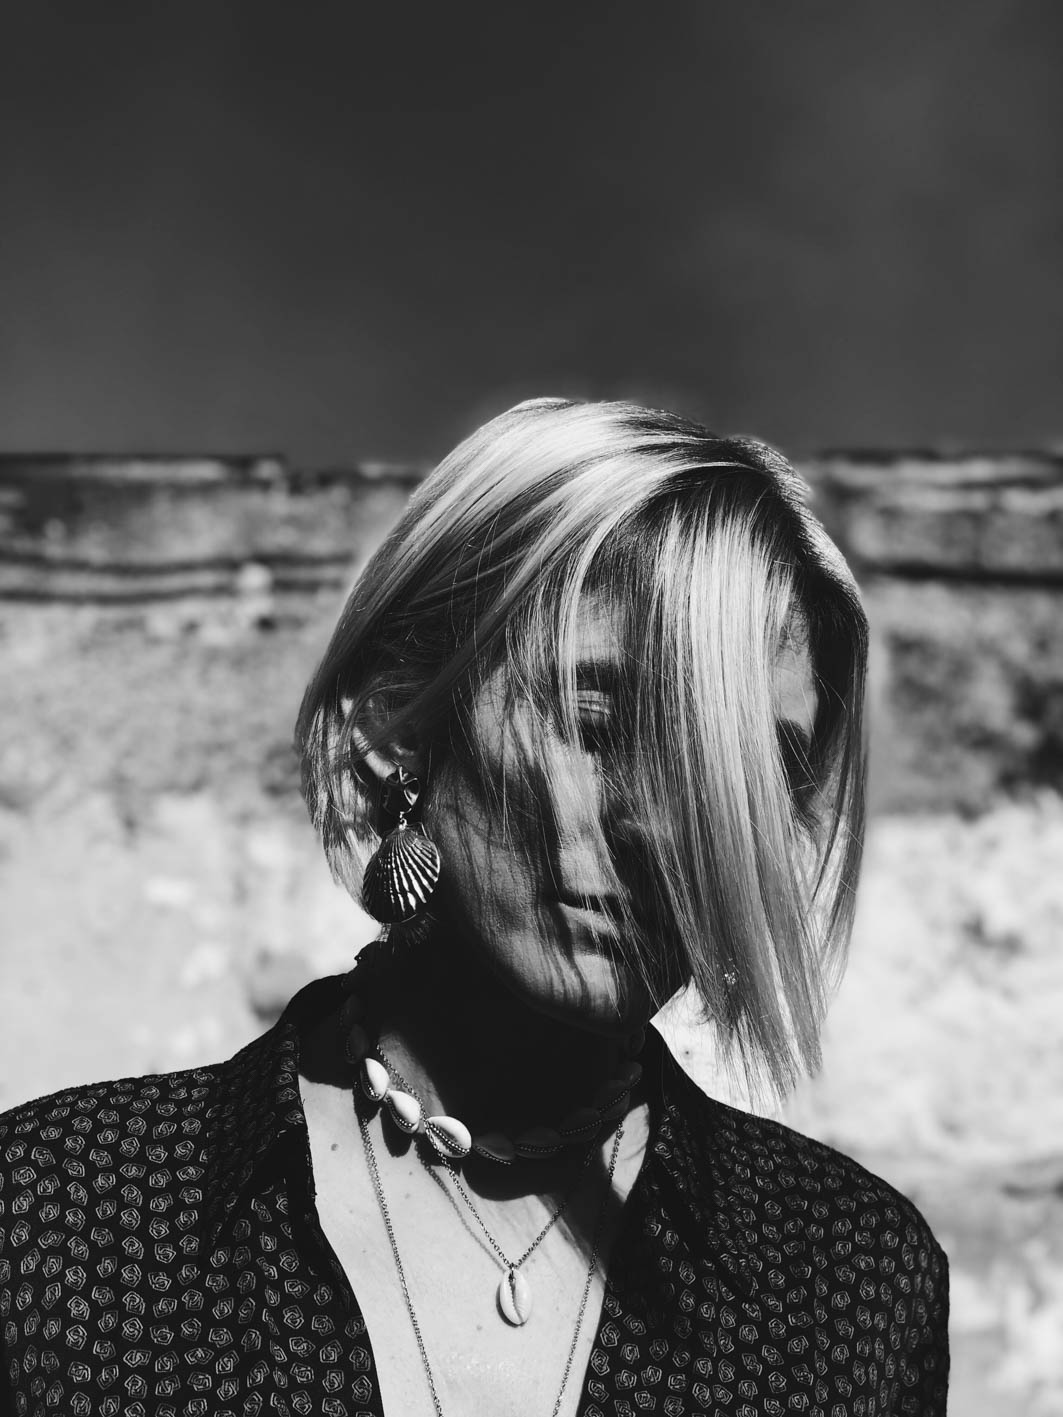 Carnet sauvage- blog mode et tendances - Bijoux coquillages9.jpg